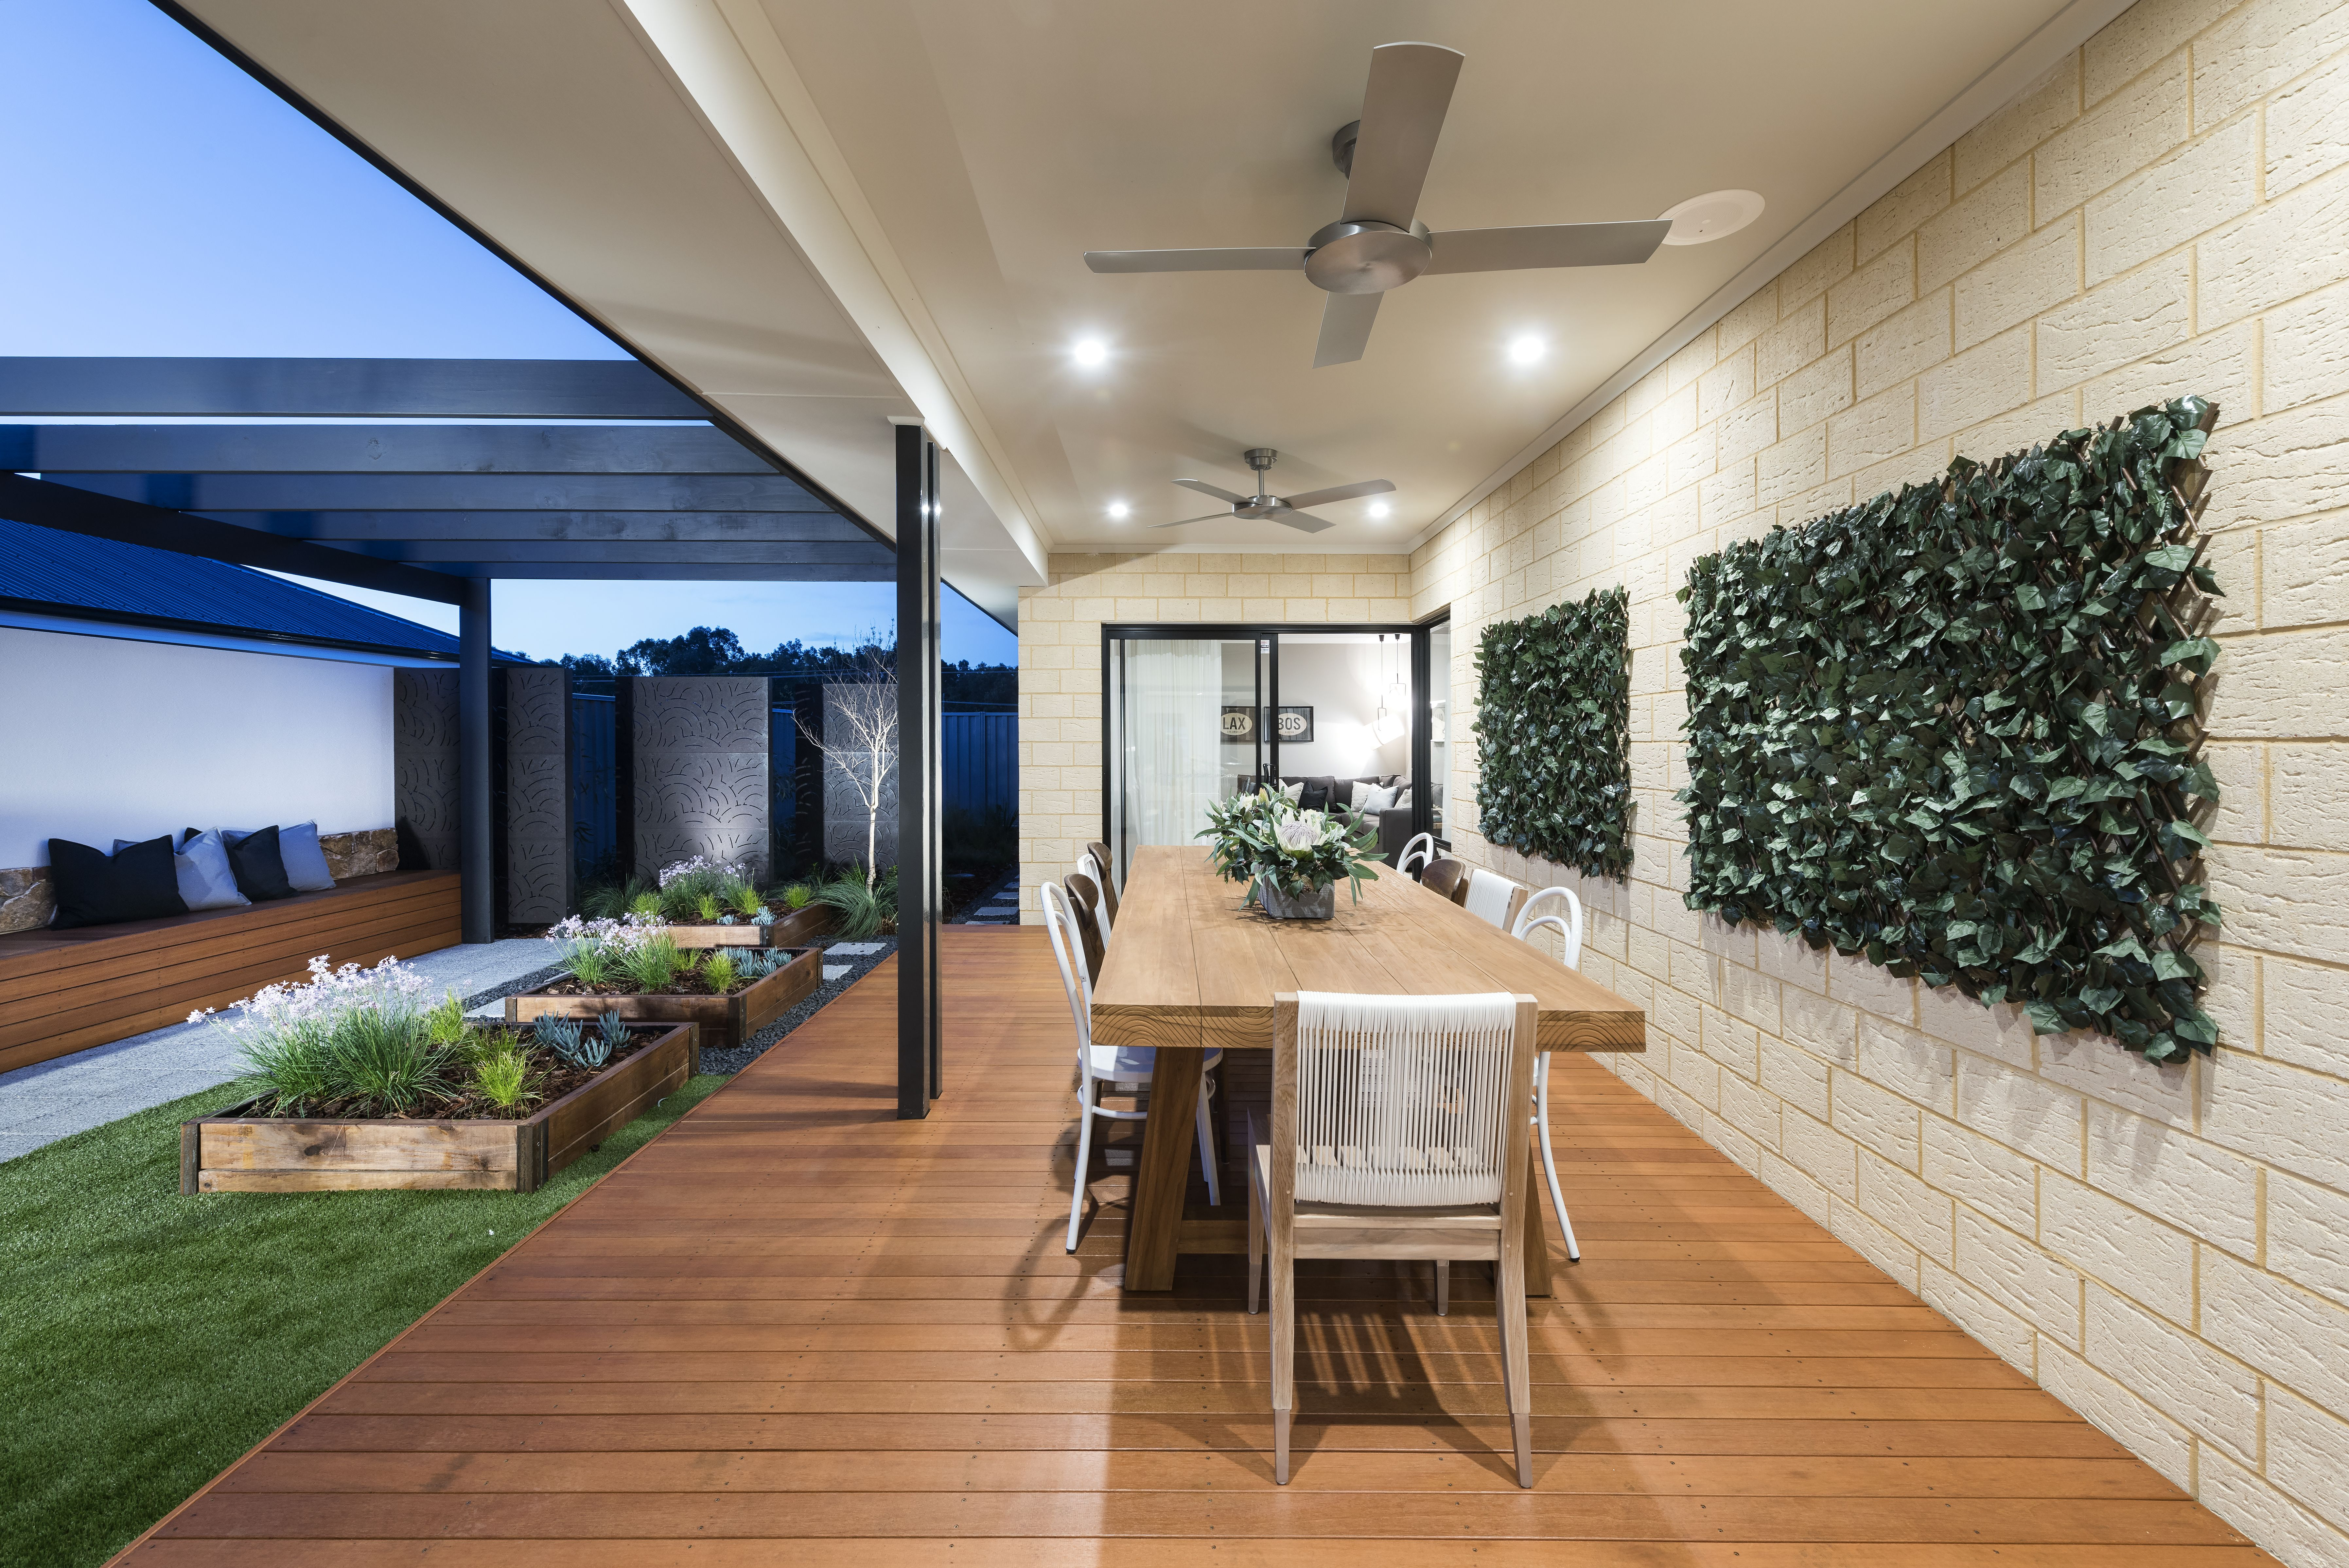 Cream Brick Exterior Ideas Outdoor Patio Designs Exterior Brick Exterior House Colors